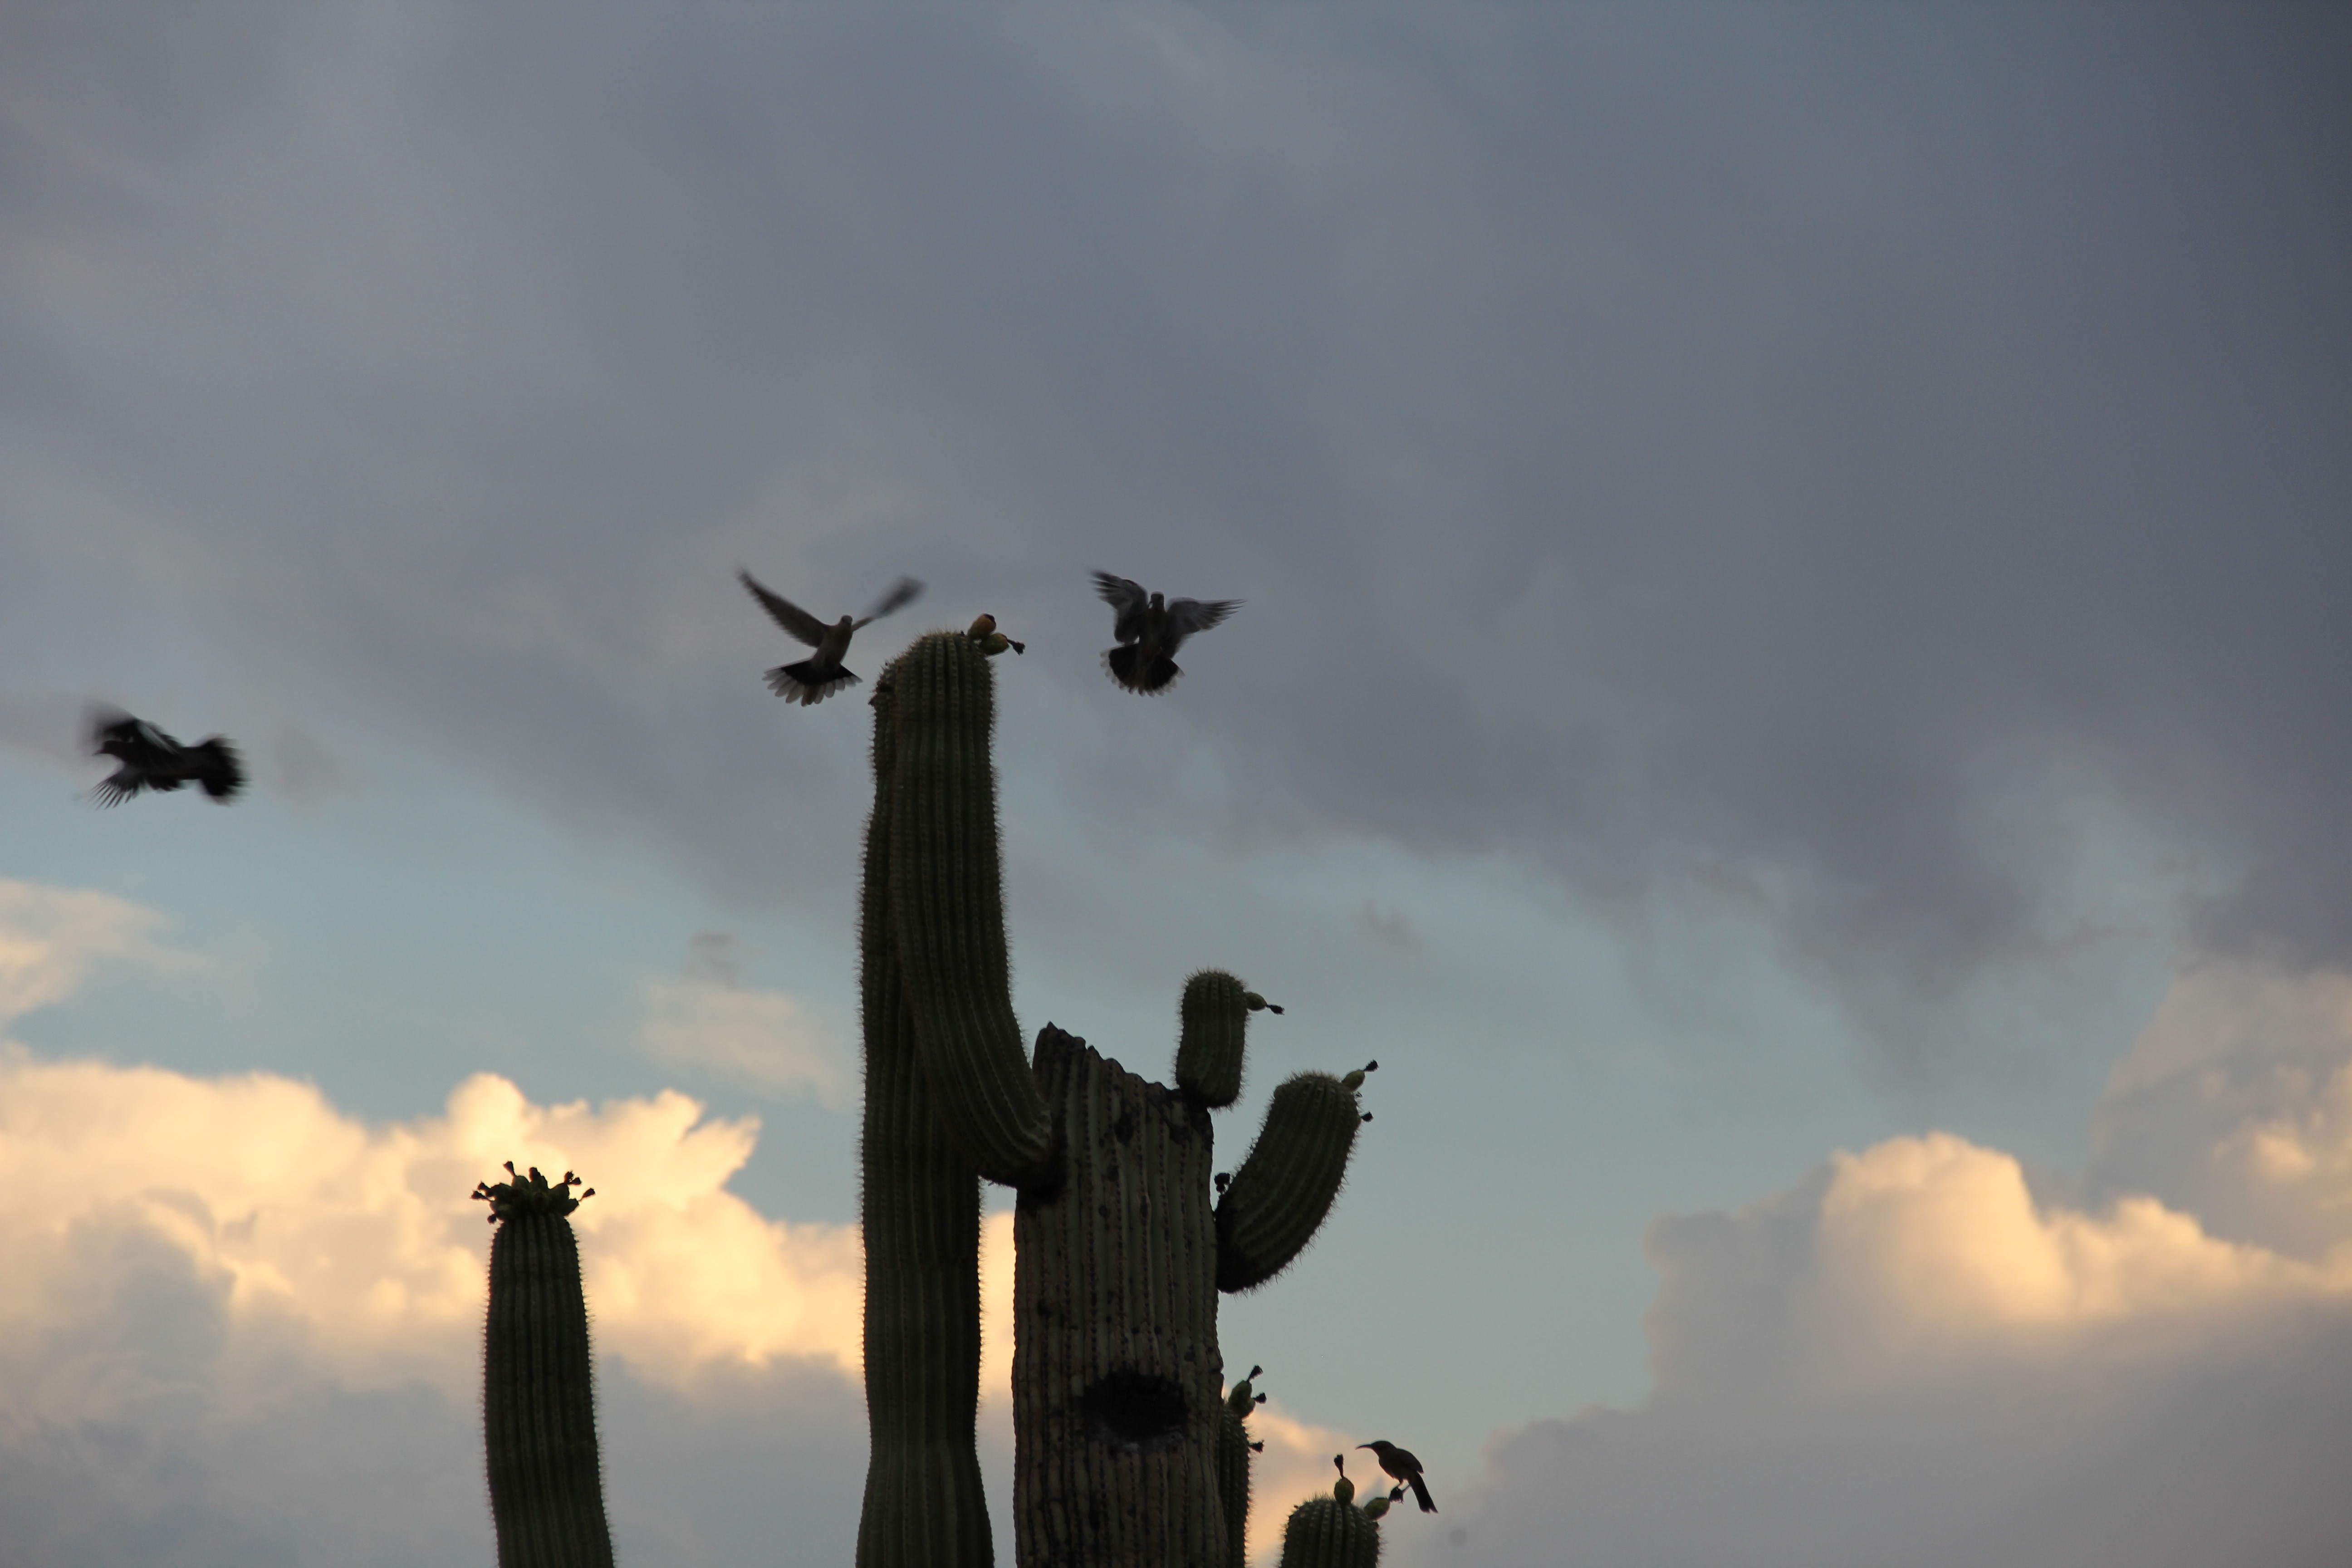 doves alightingA